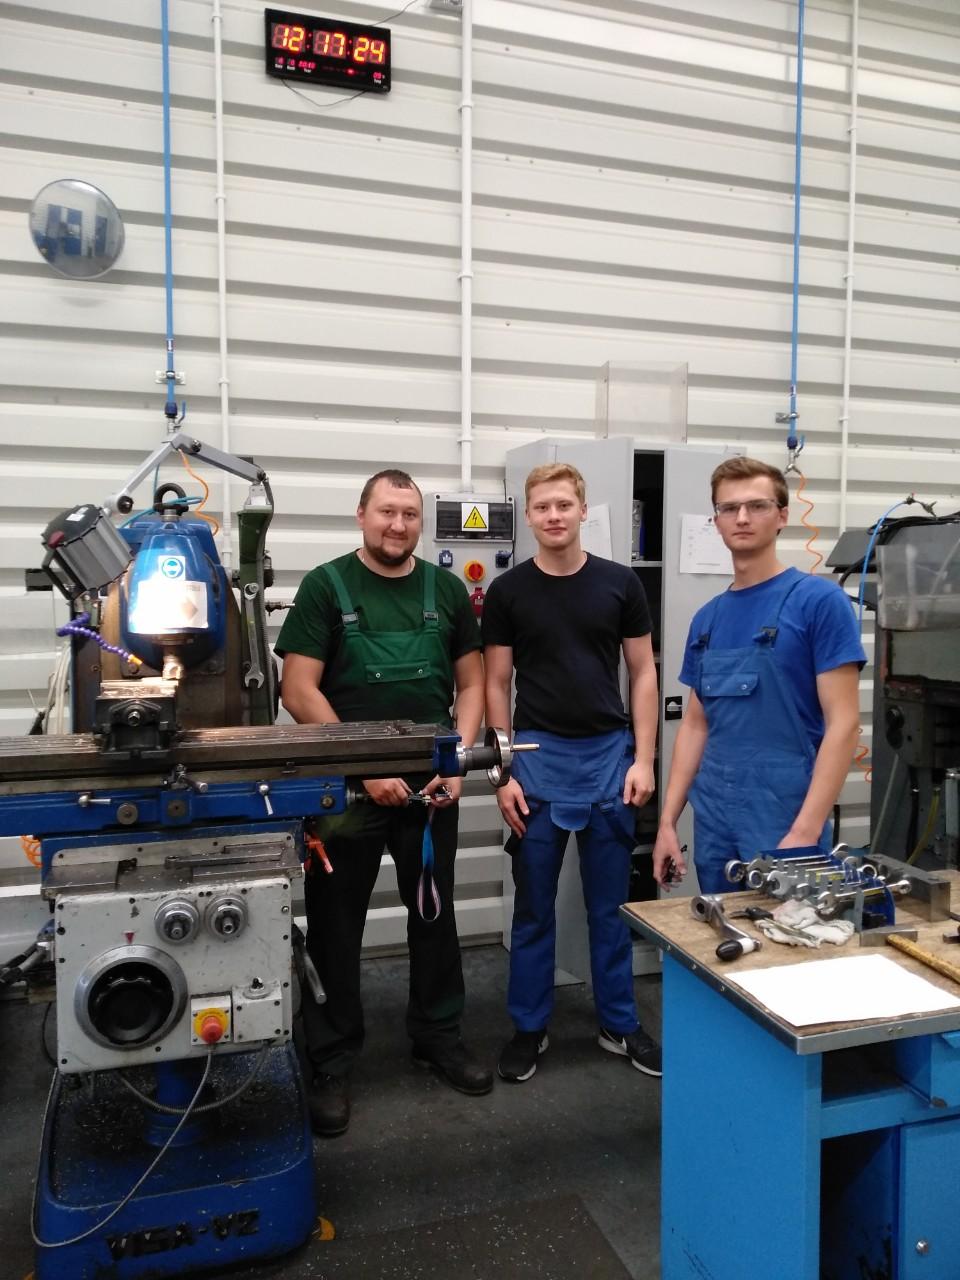 Студенты МСФ проходят практику на предприятиях Польши muzhik1.jpg